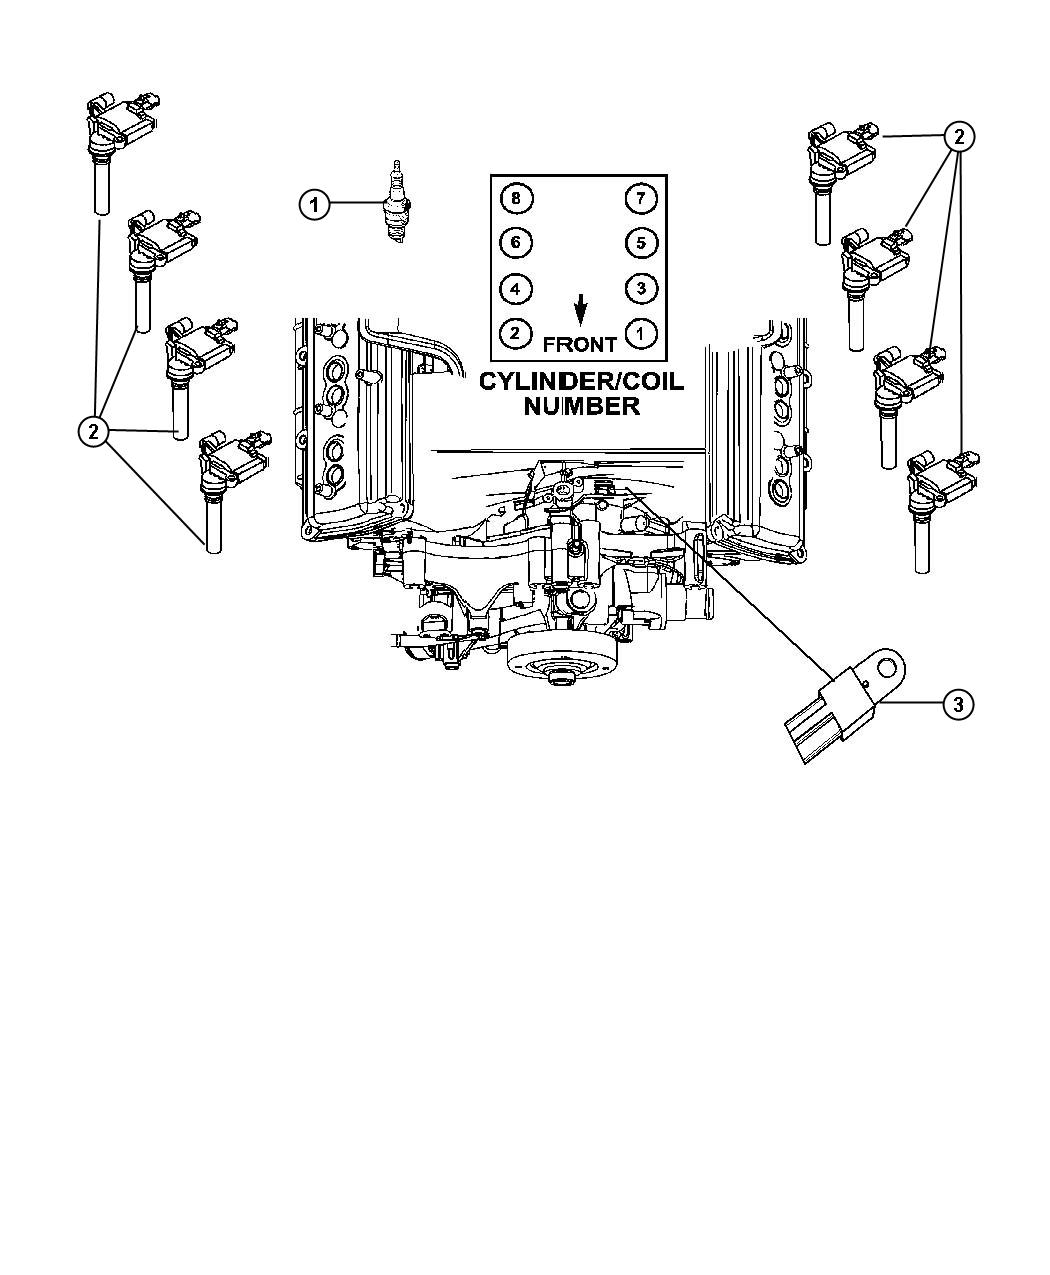 2010 Chrysler 300 Spark plug. Ignition, plugs, engine